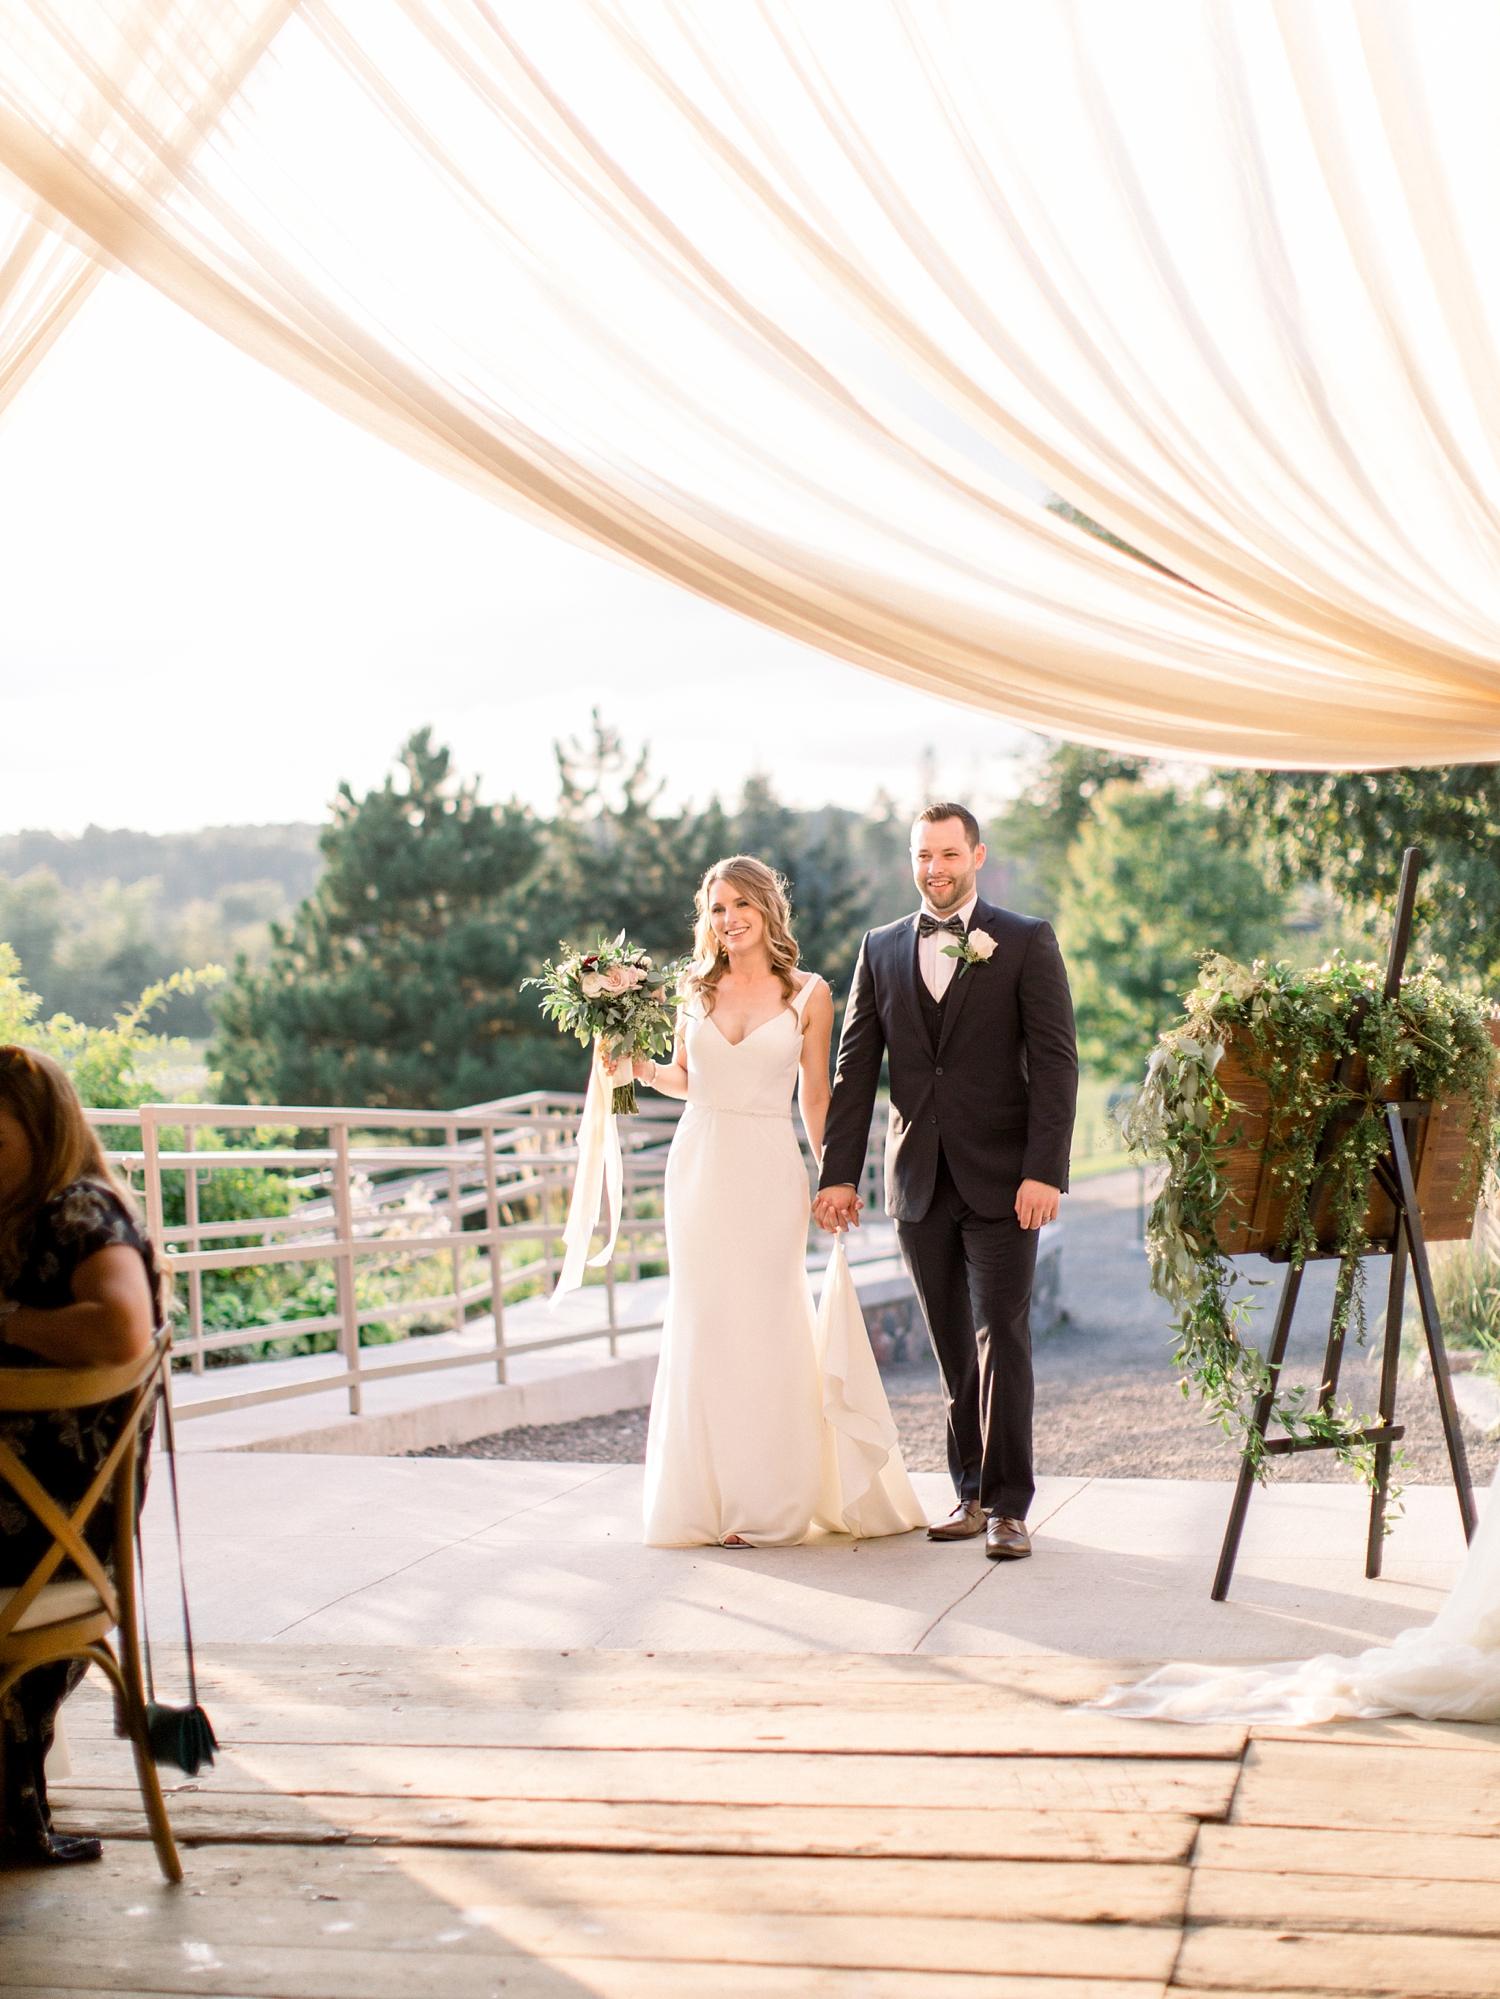 Brittany Williams Photography Wedding_0014.jpg